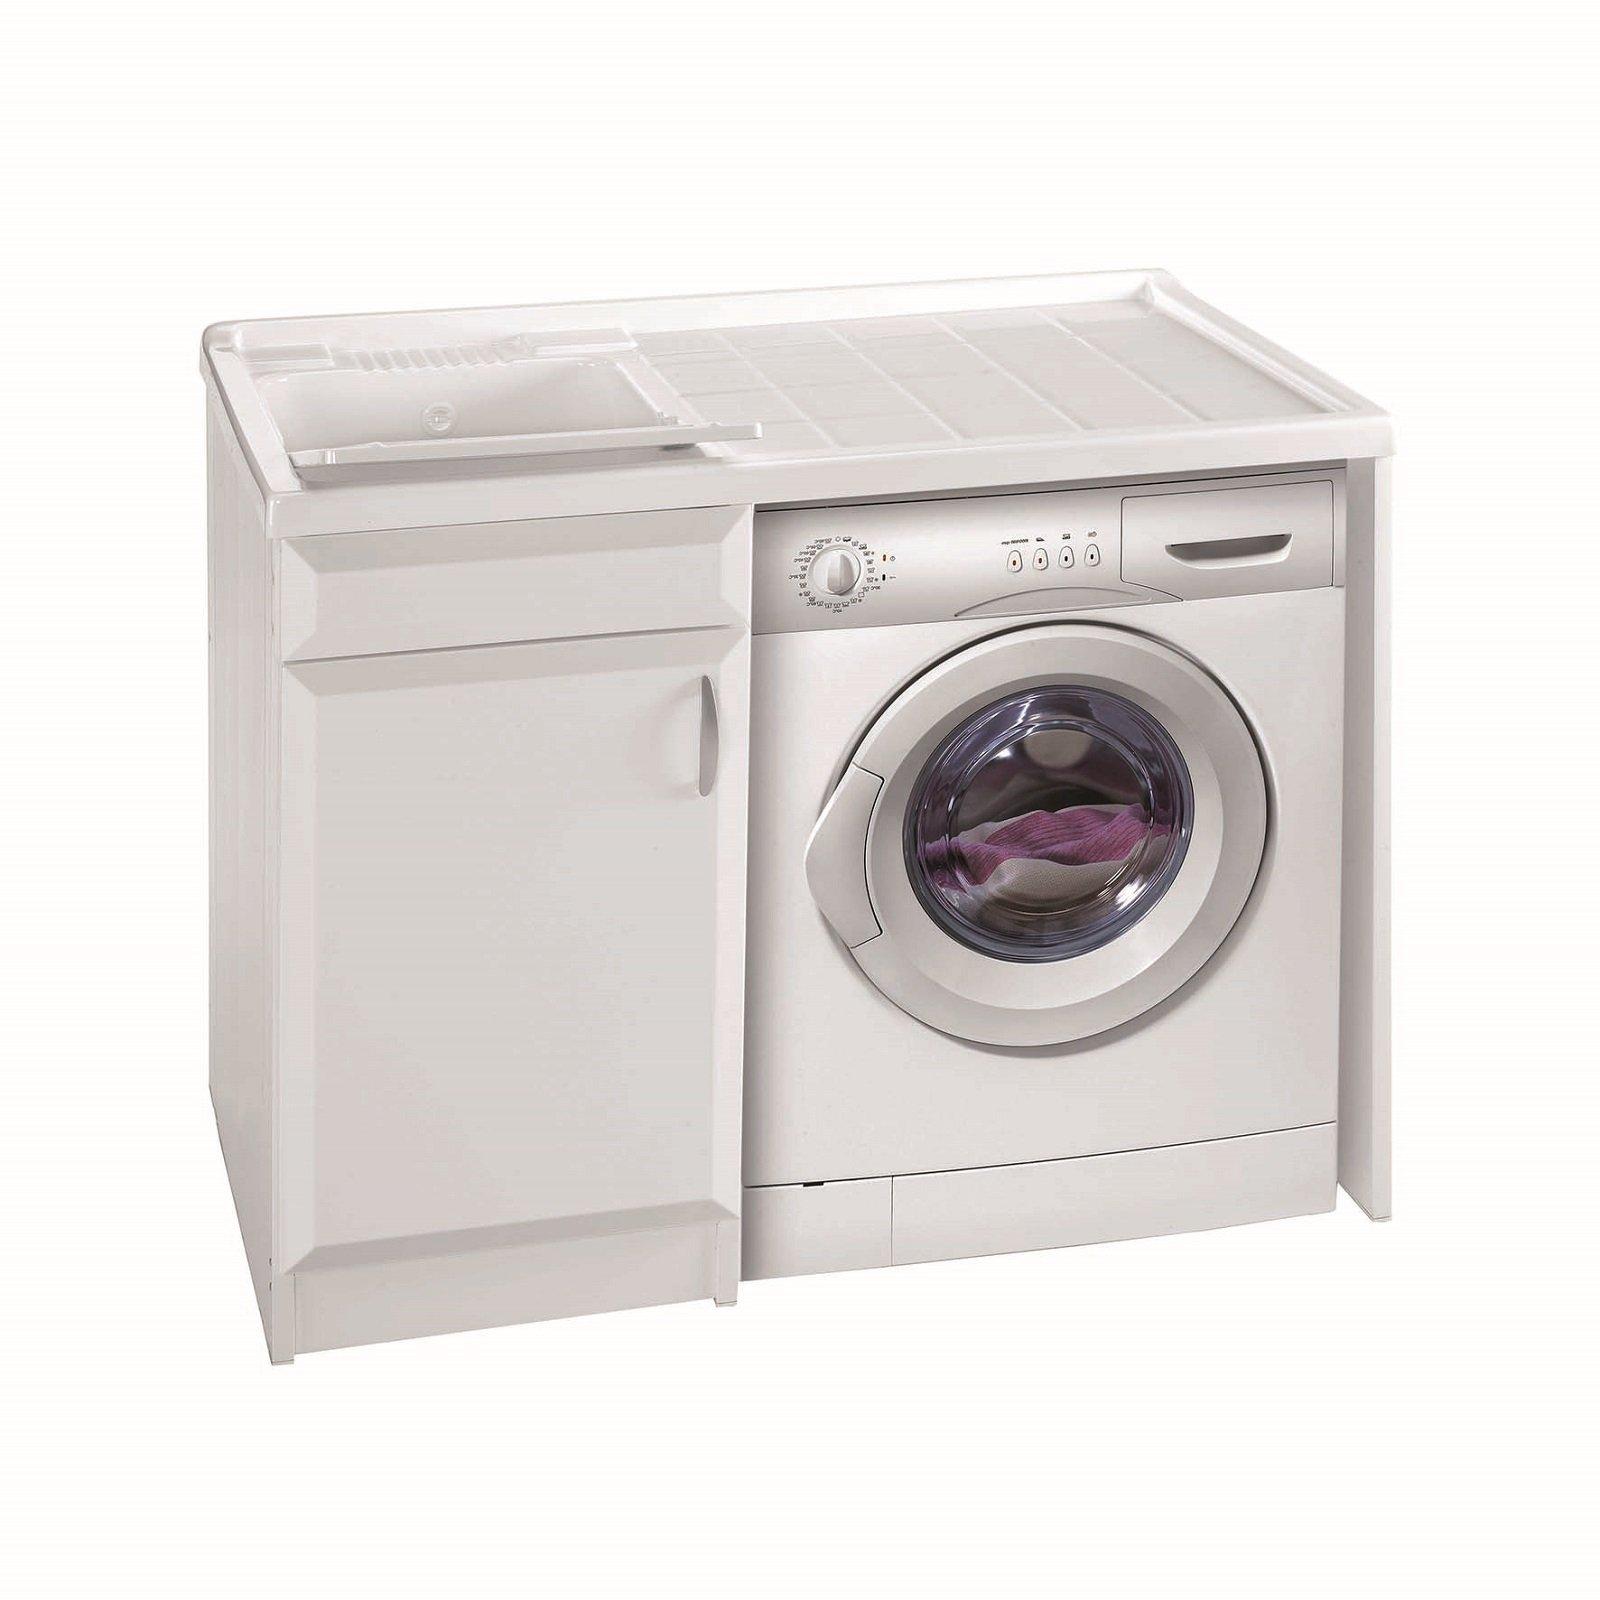 Lavanderia in bagno cose di casa for Mobile bagno sospeso leroy merlin